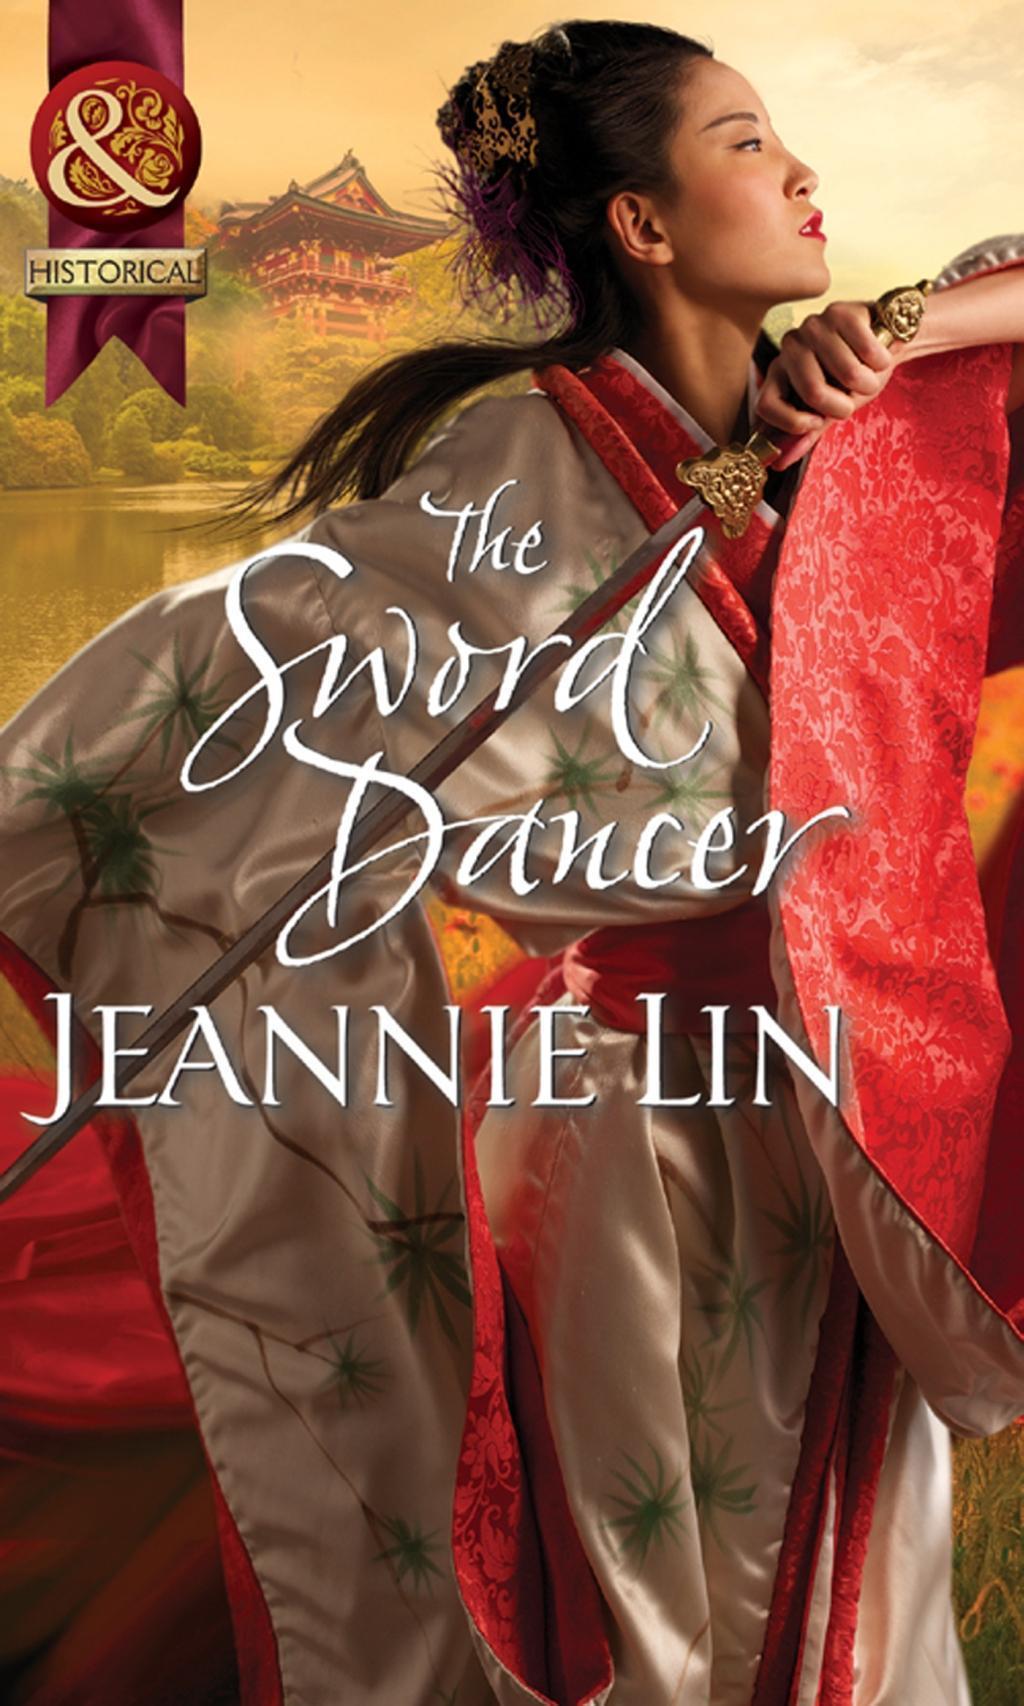 The Sword Dancer (Mills & Boon Historical)